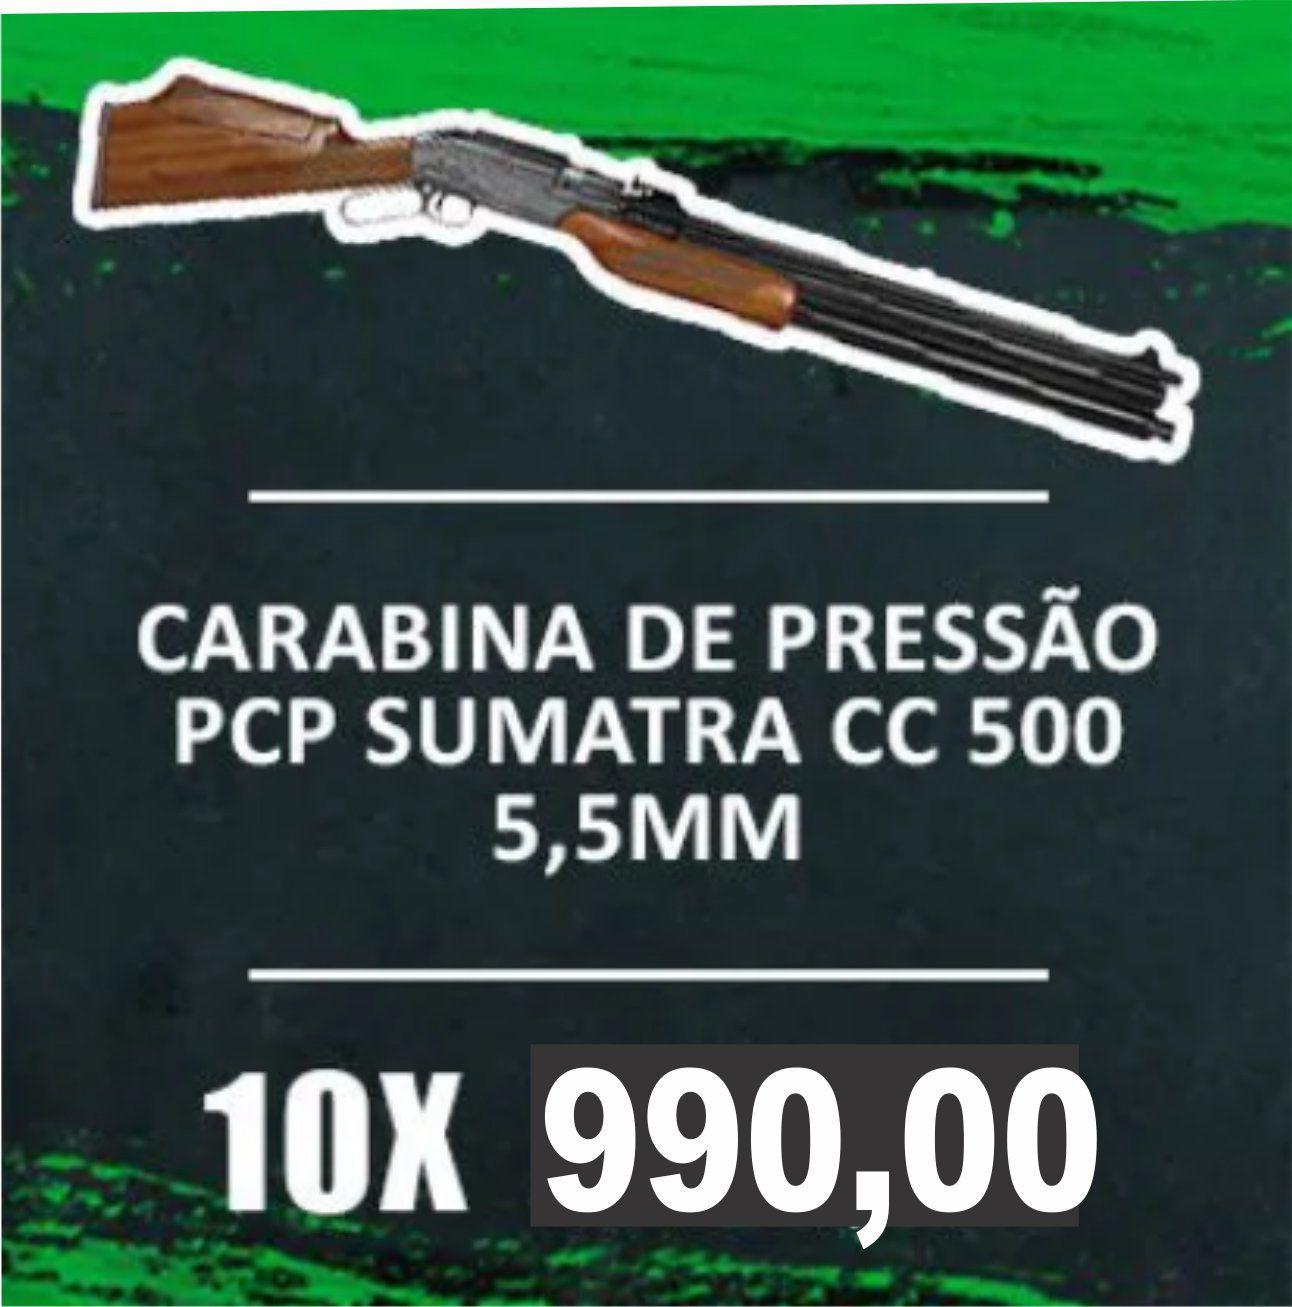 Consórcio - Carabina de Pressão PCP Sumatra CC 500  5,5mm